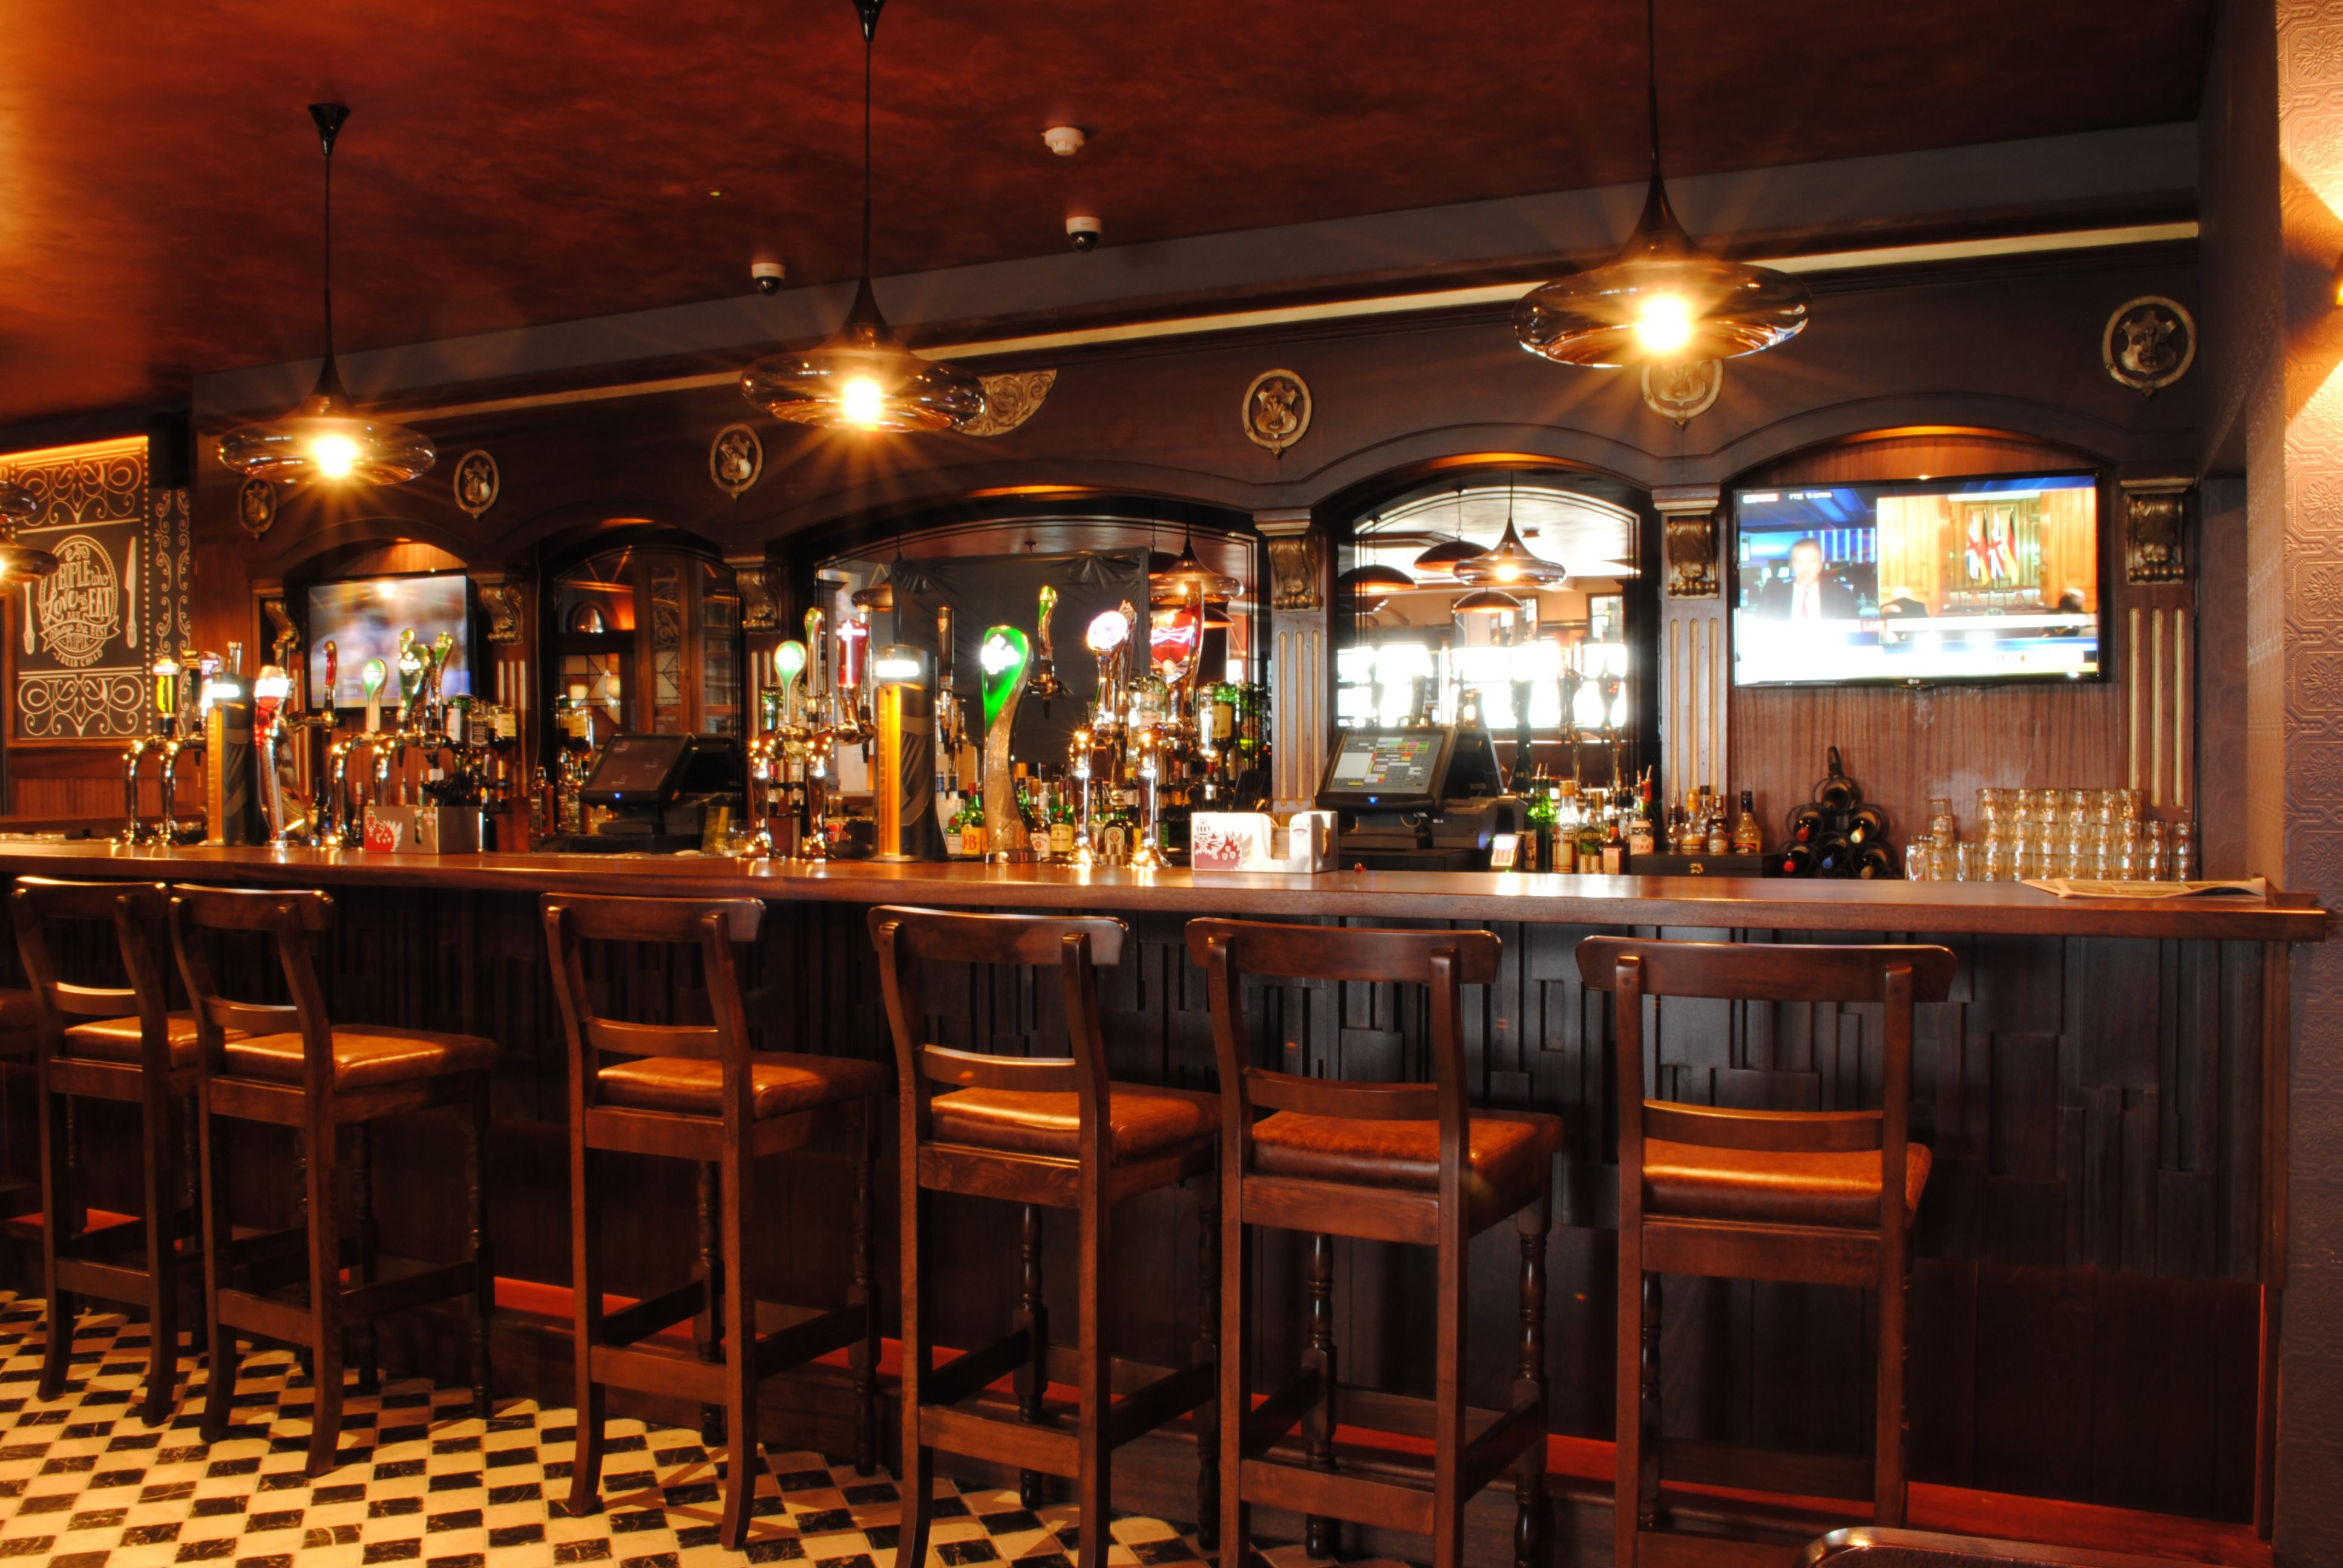 Muebles Pub Irlandes - Pub Irlandes Dise O Buscar Con Google Furniture Pinterest [mjhdah]http://www.urdailife.com/wp-content/uploads/2017/12/Izaro-irish-pub-bermeo-4b.jpg